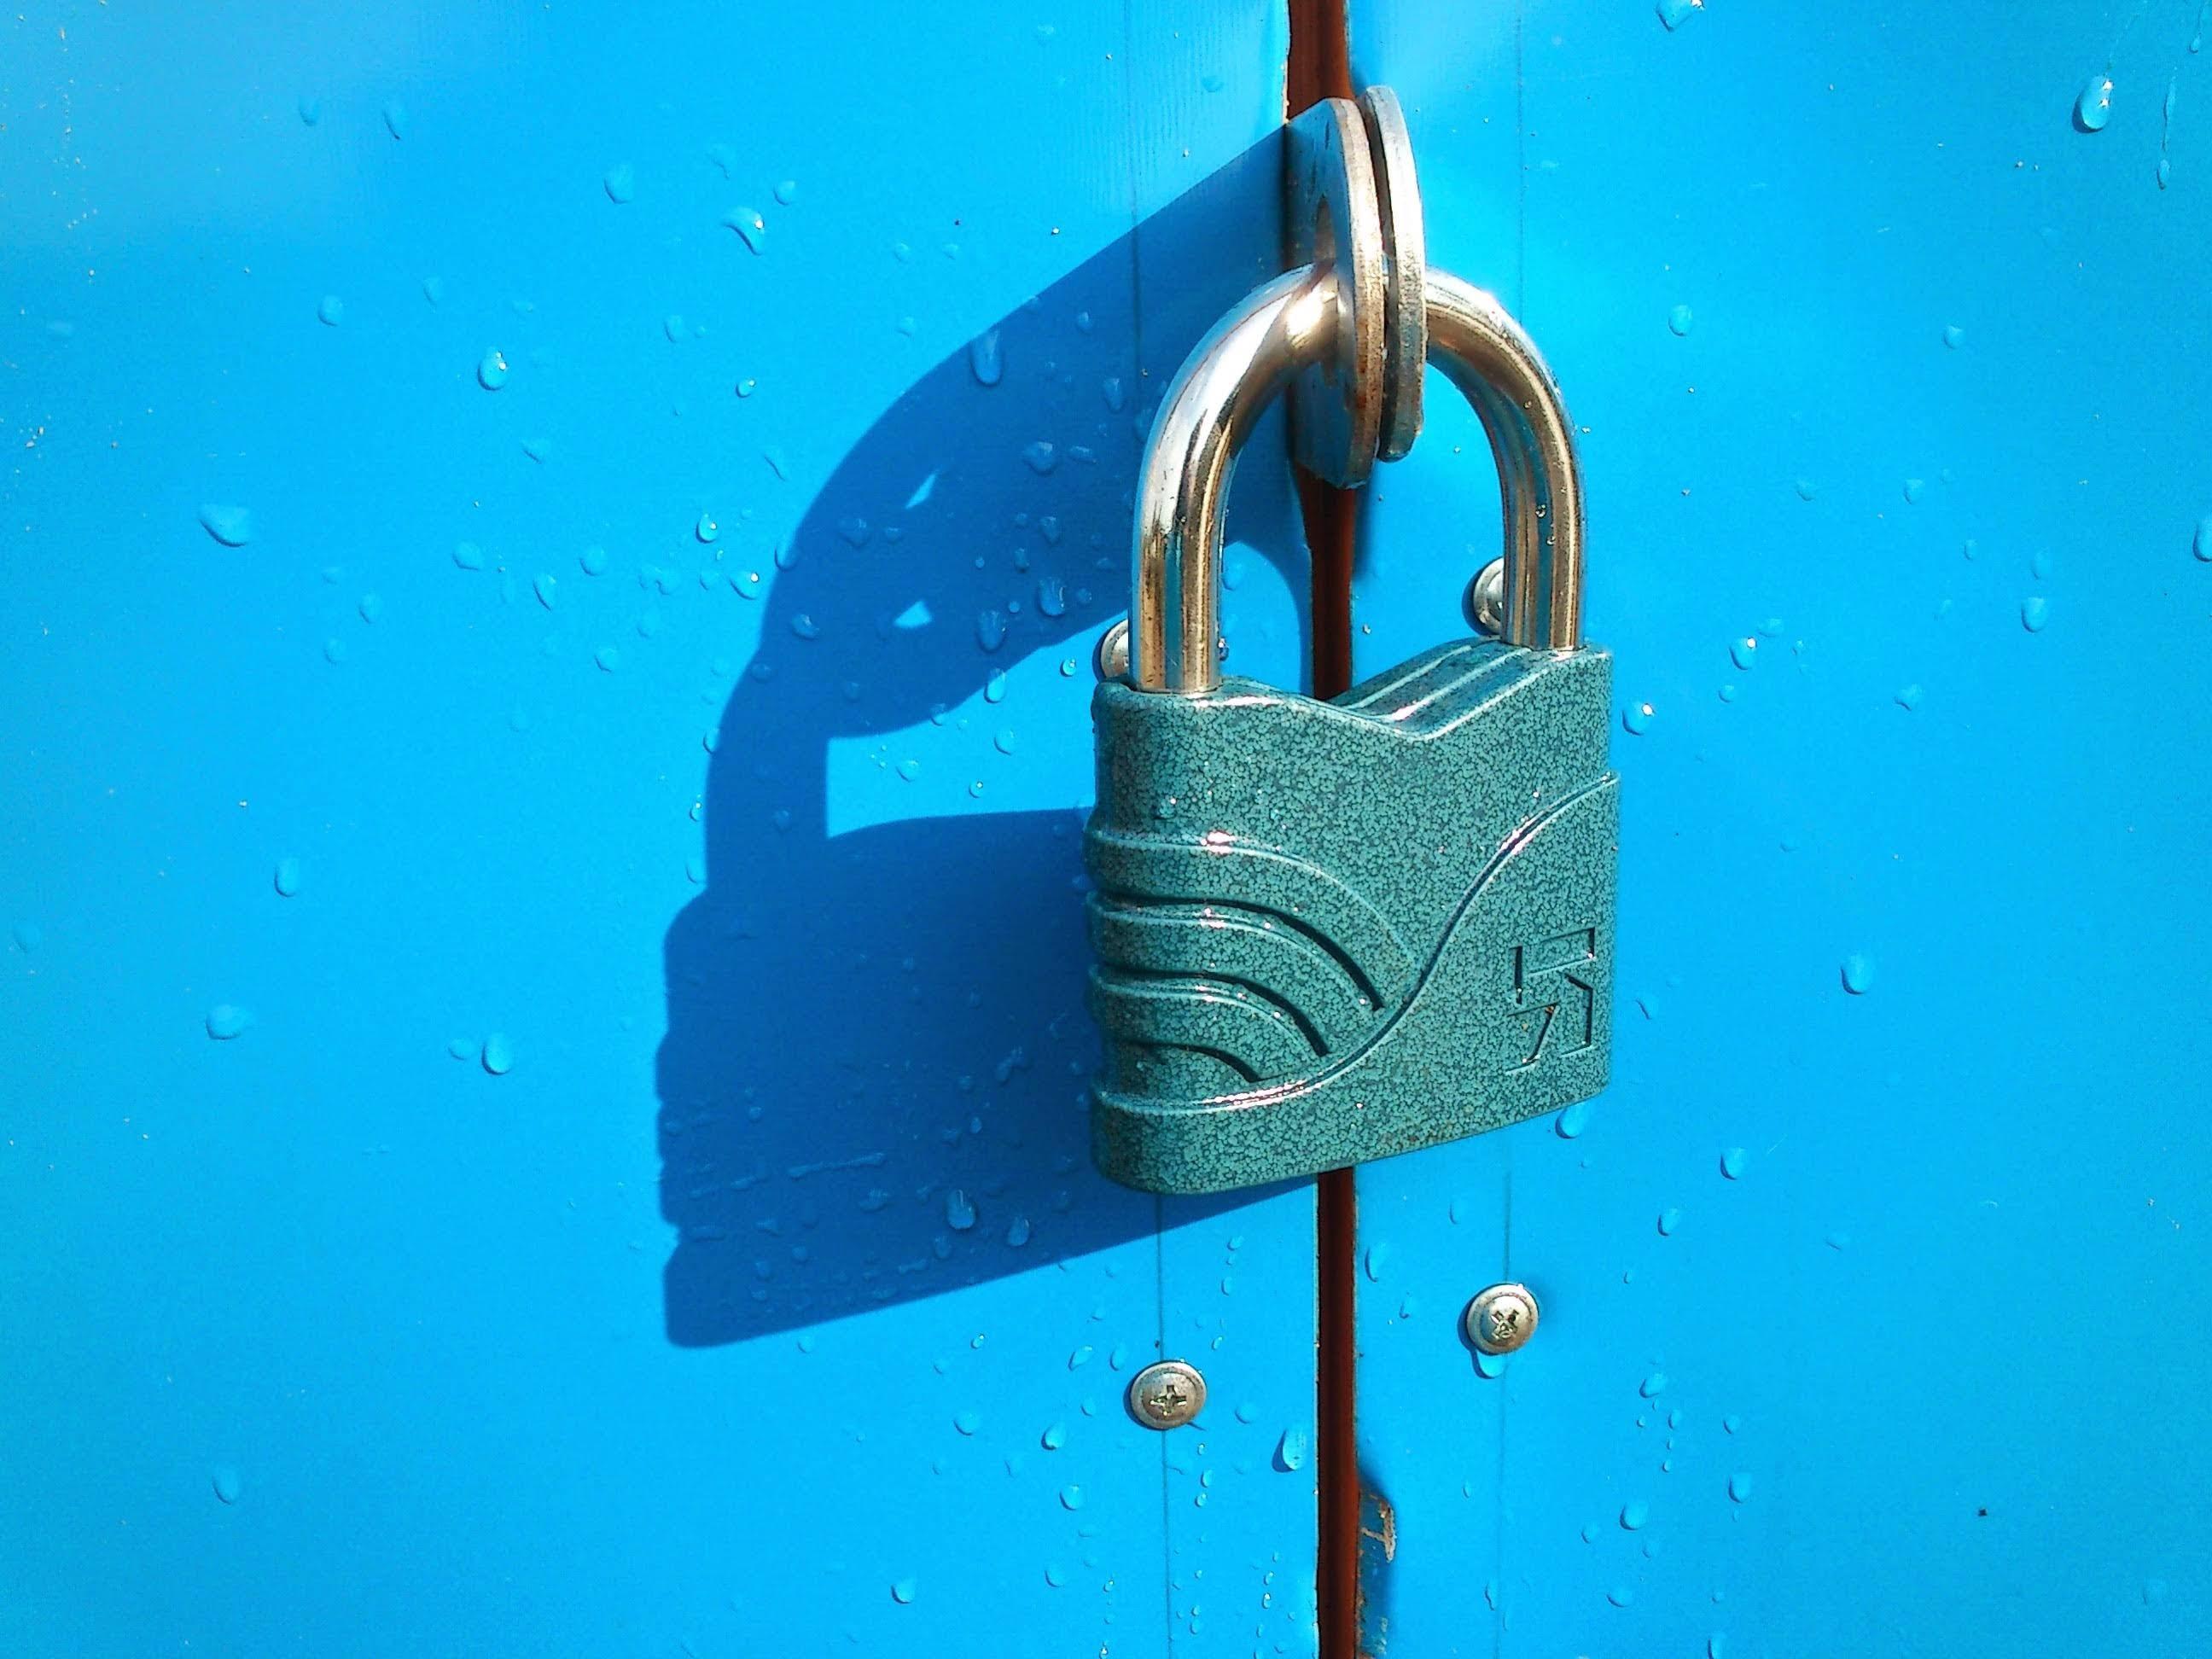 Authentication to sensenet with IdentityServer4